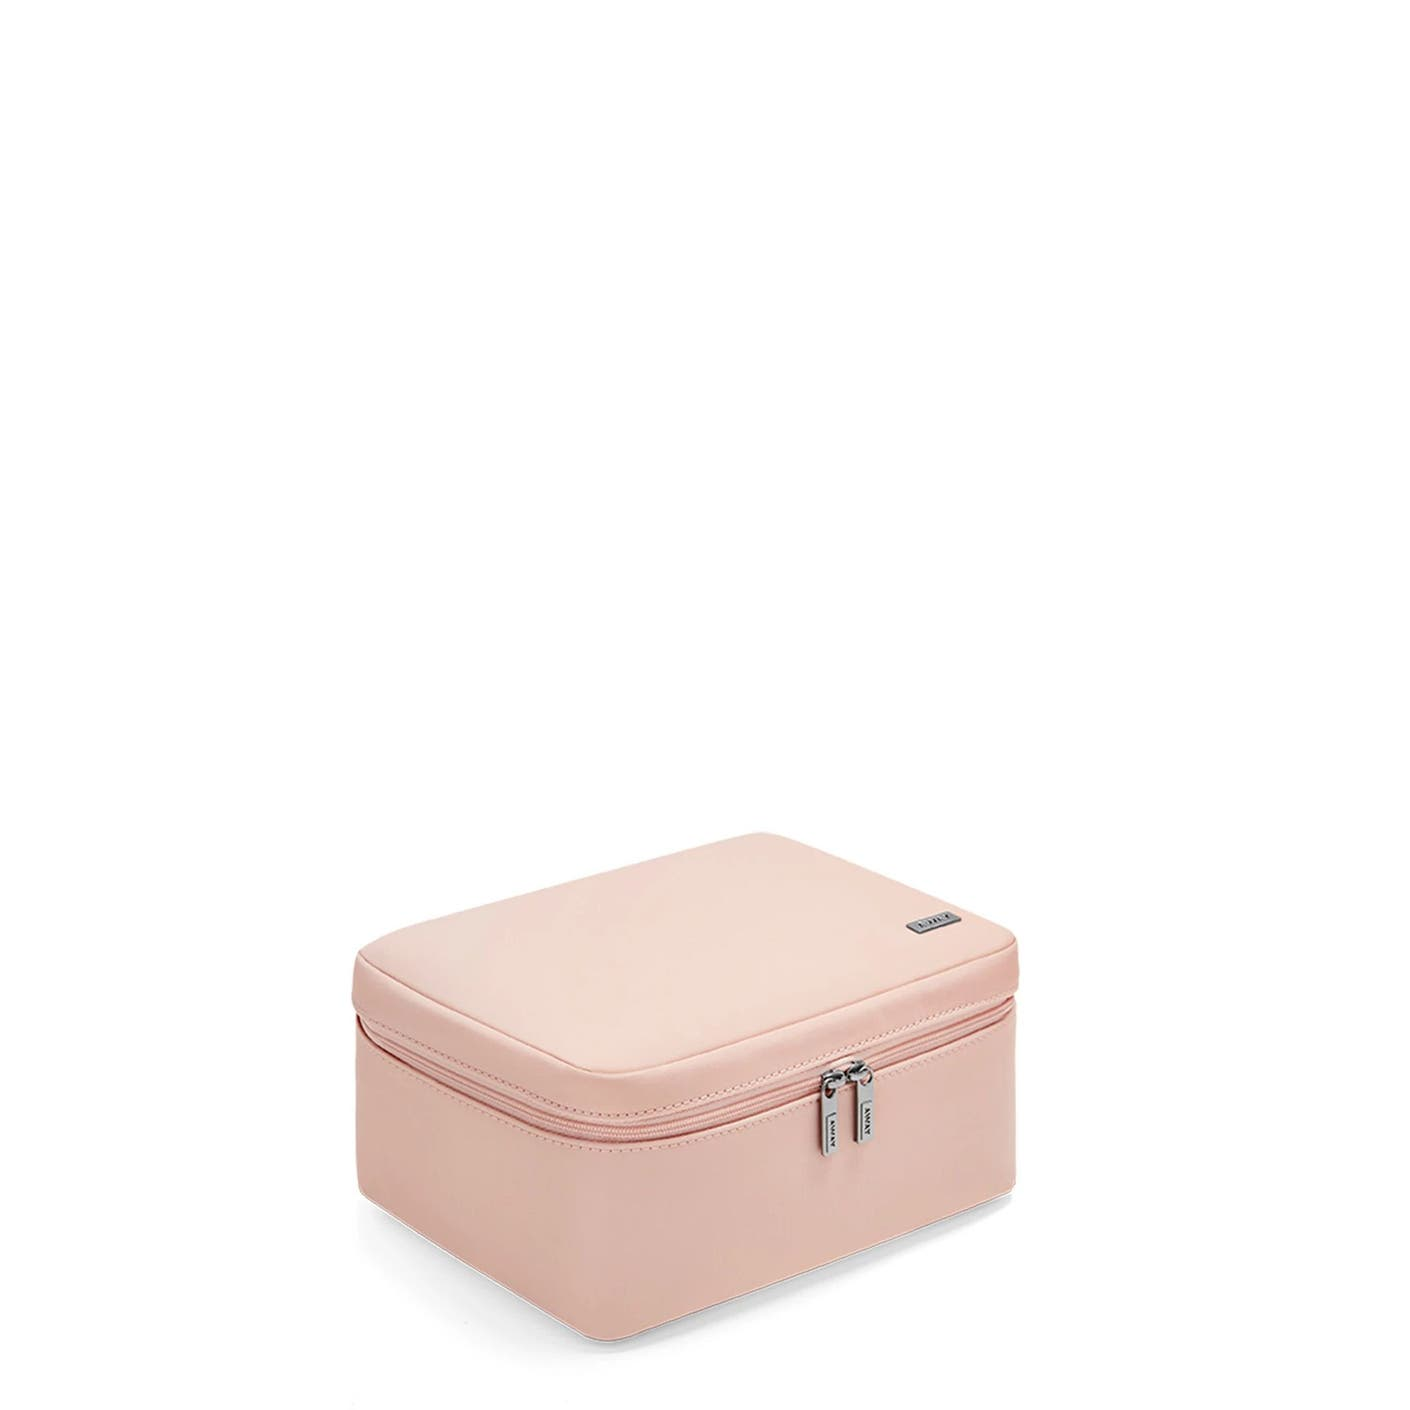 The Cosmetics Bag